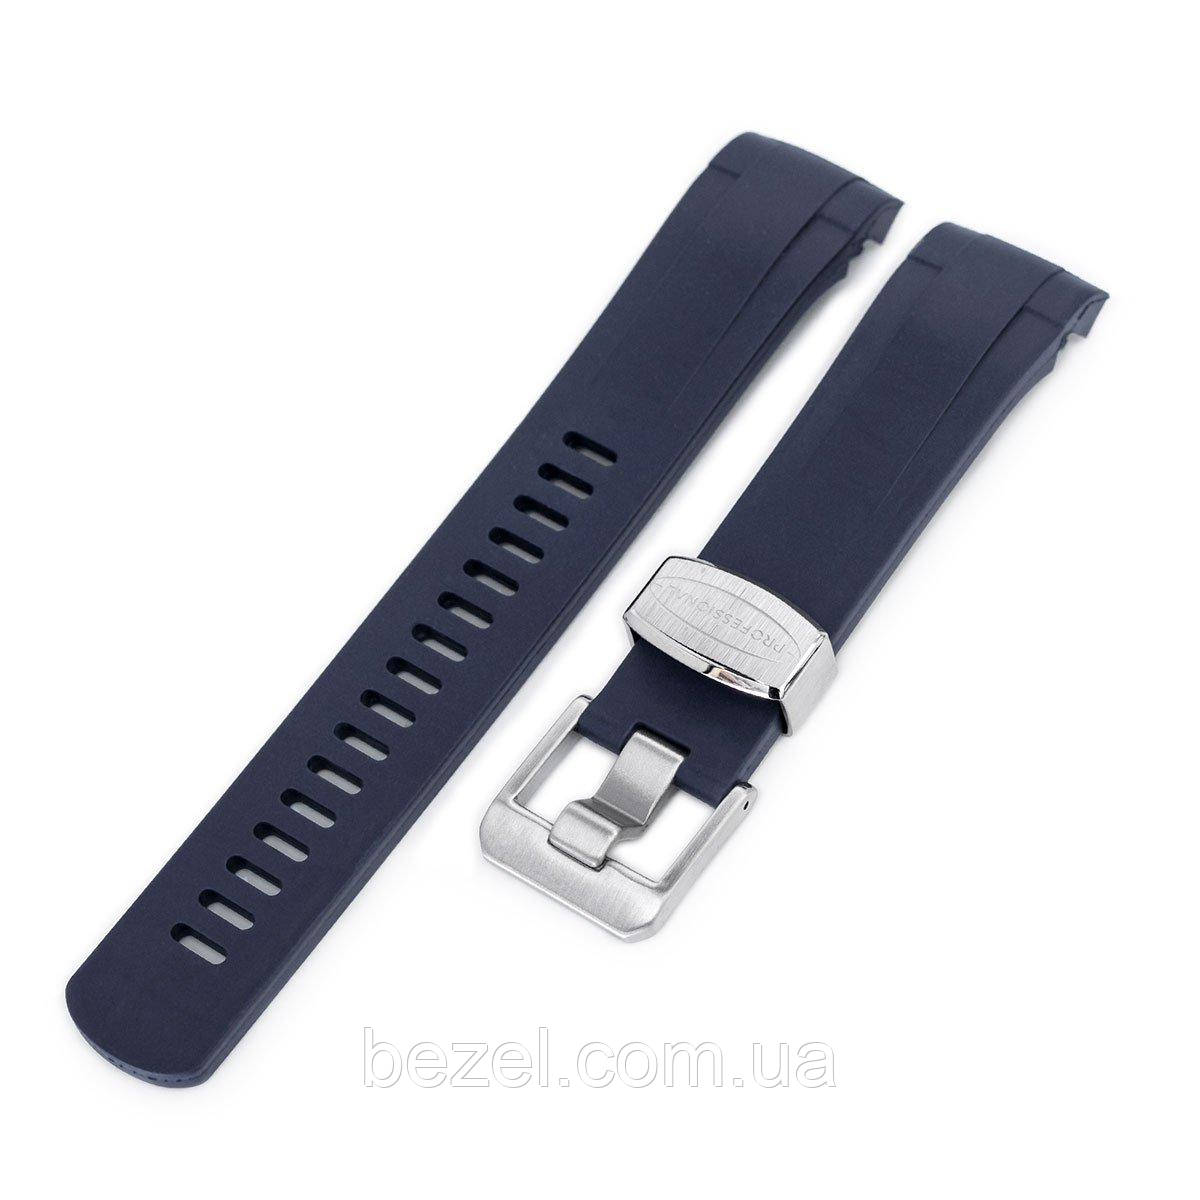 22mm Crafter Blue - Dark Blue Rubber Curved Lug Watch Strap for Tudor Black Bay M79230